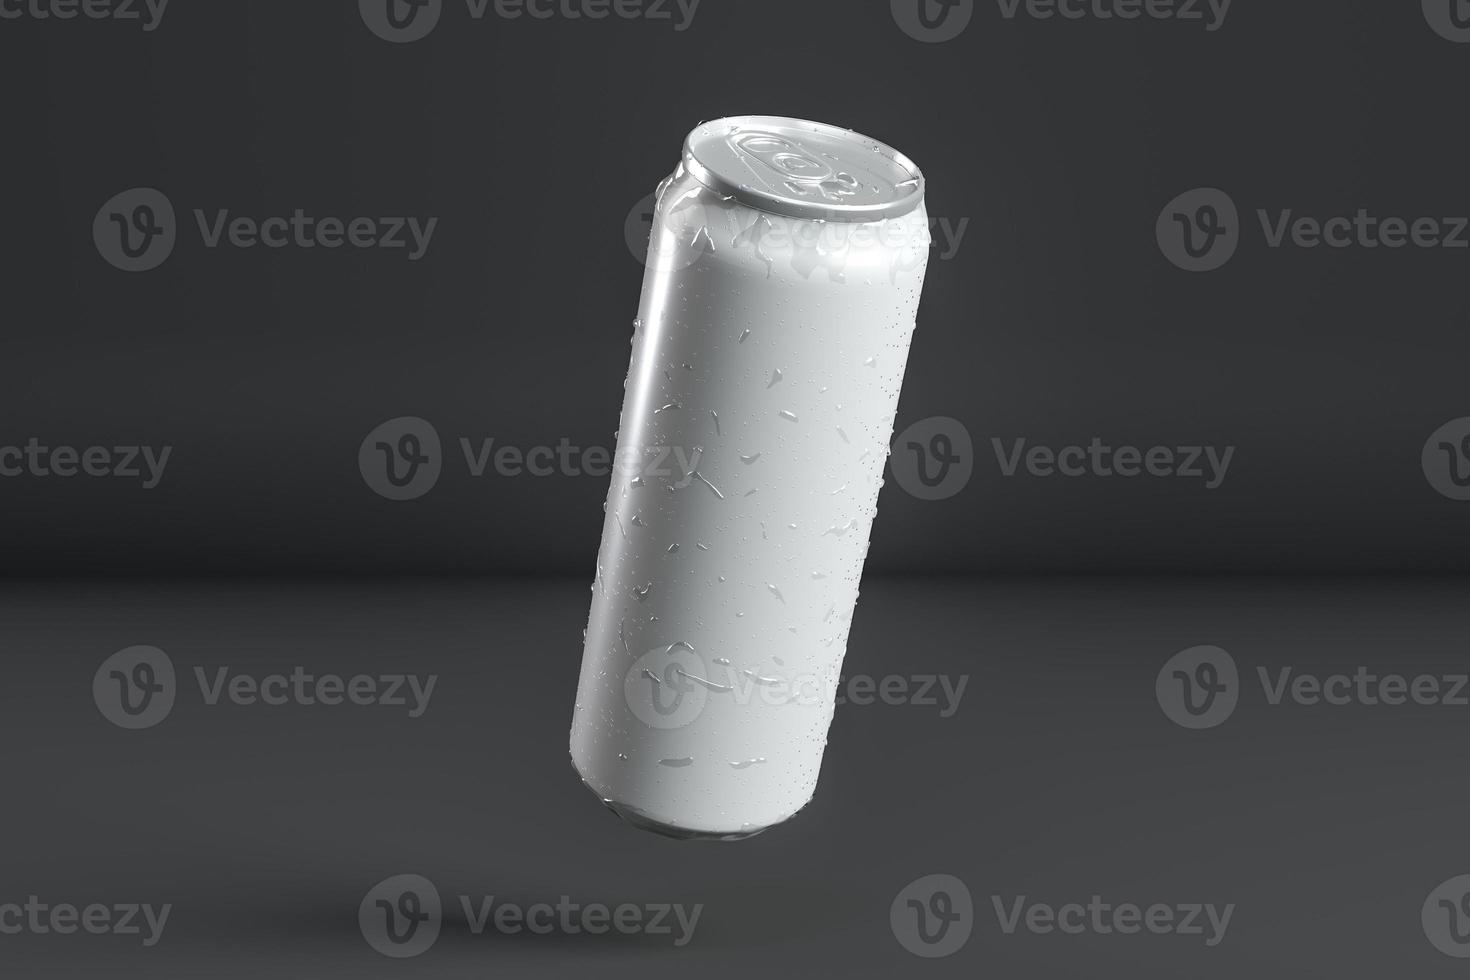 Aluminiumdose Präsentation. Auflösung und hohe Qualität schönes Foto